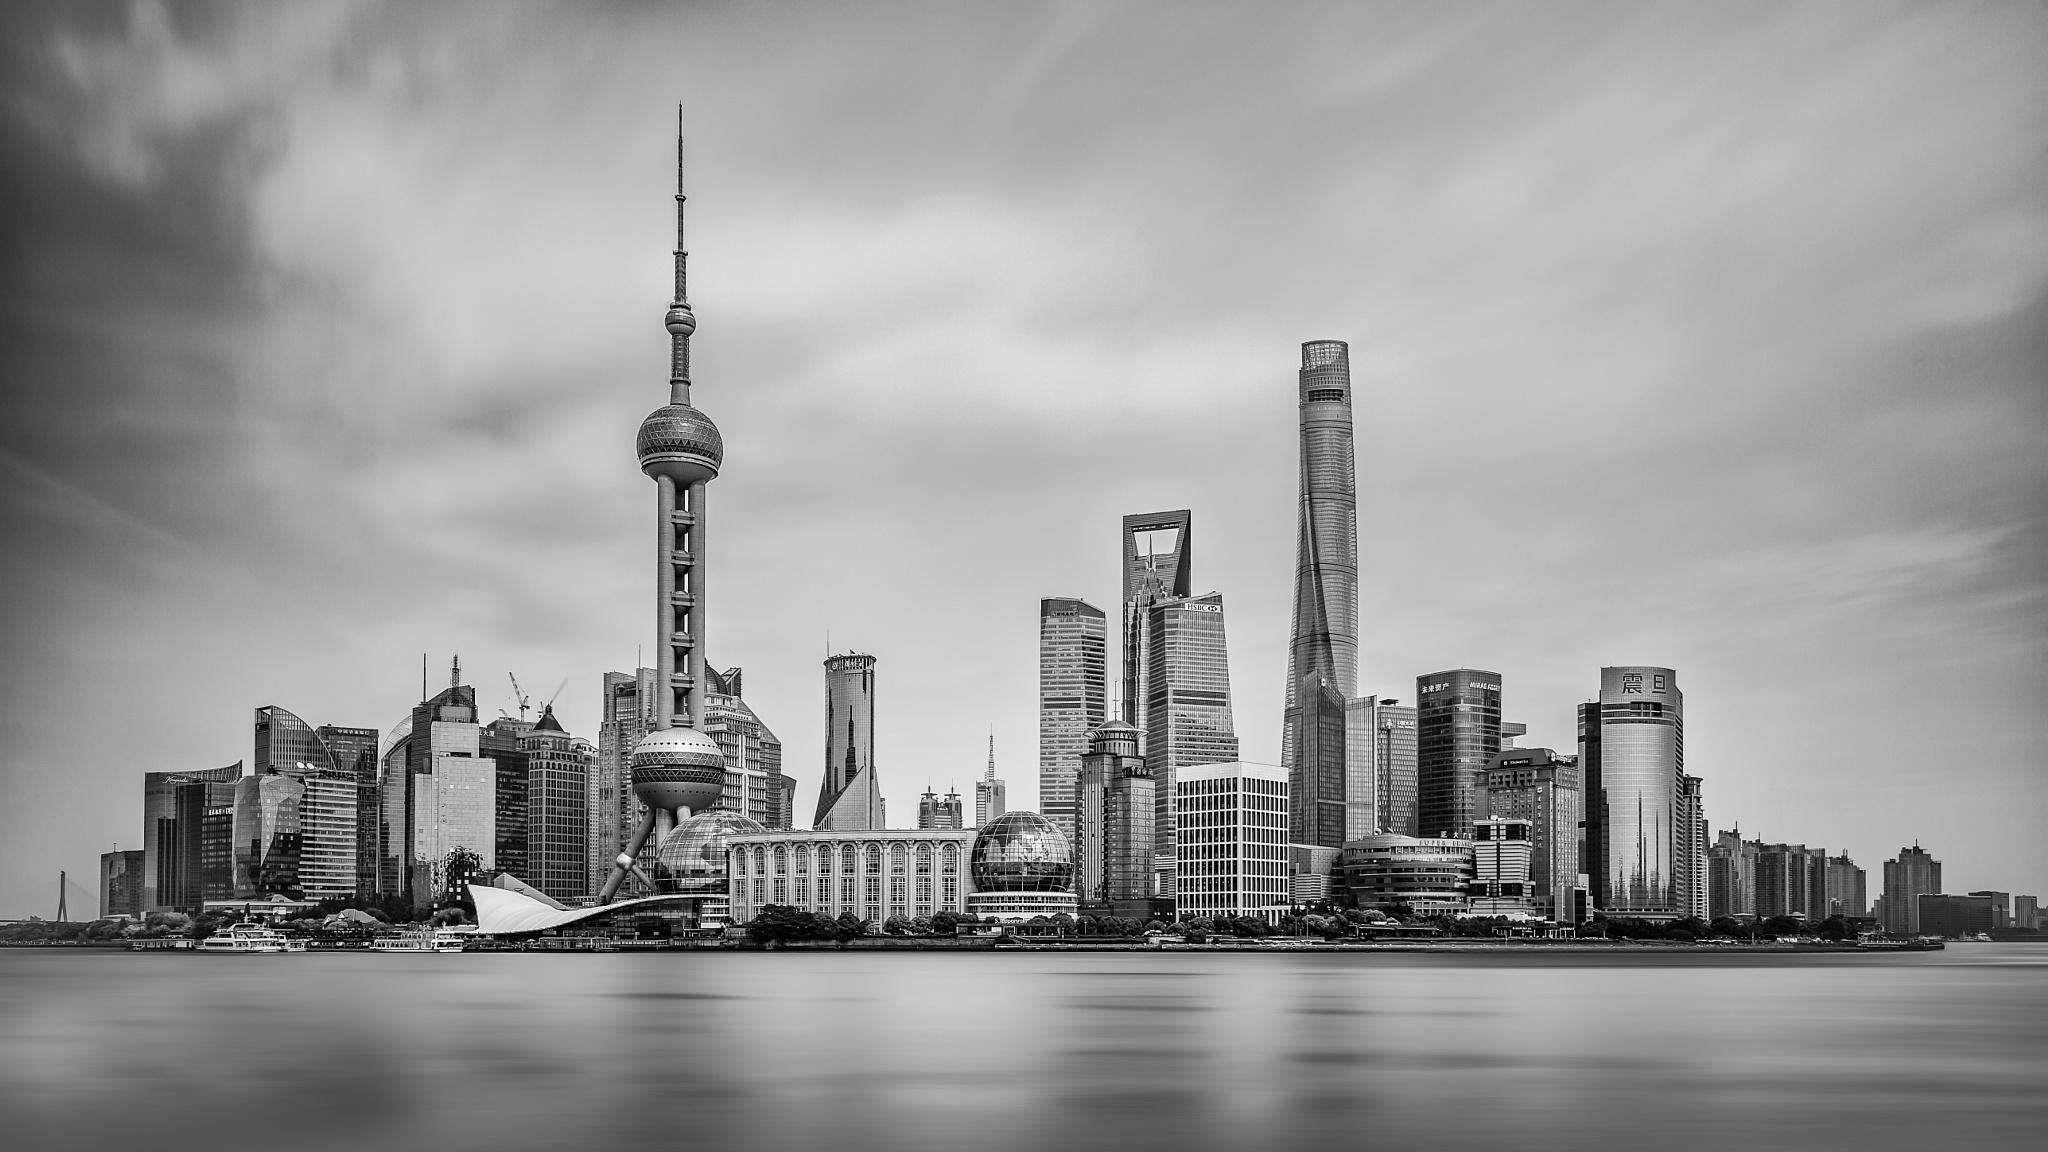 Shanghai Pudong Skyline by CamHadlowPhotography